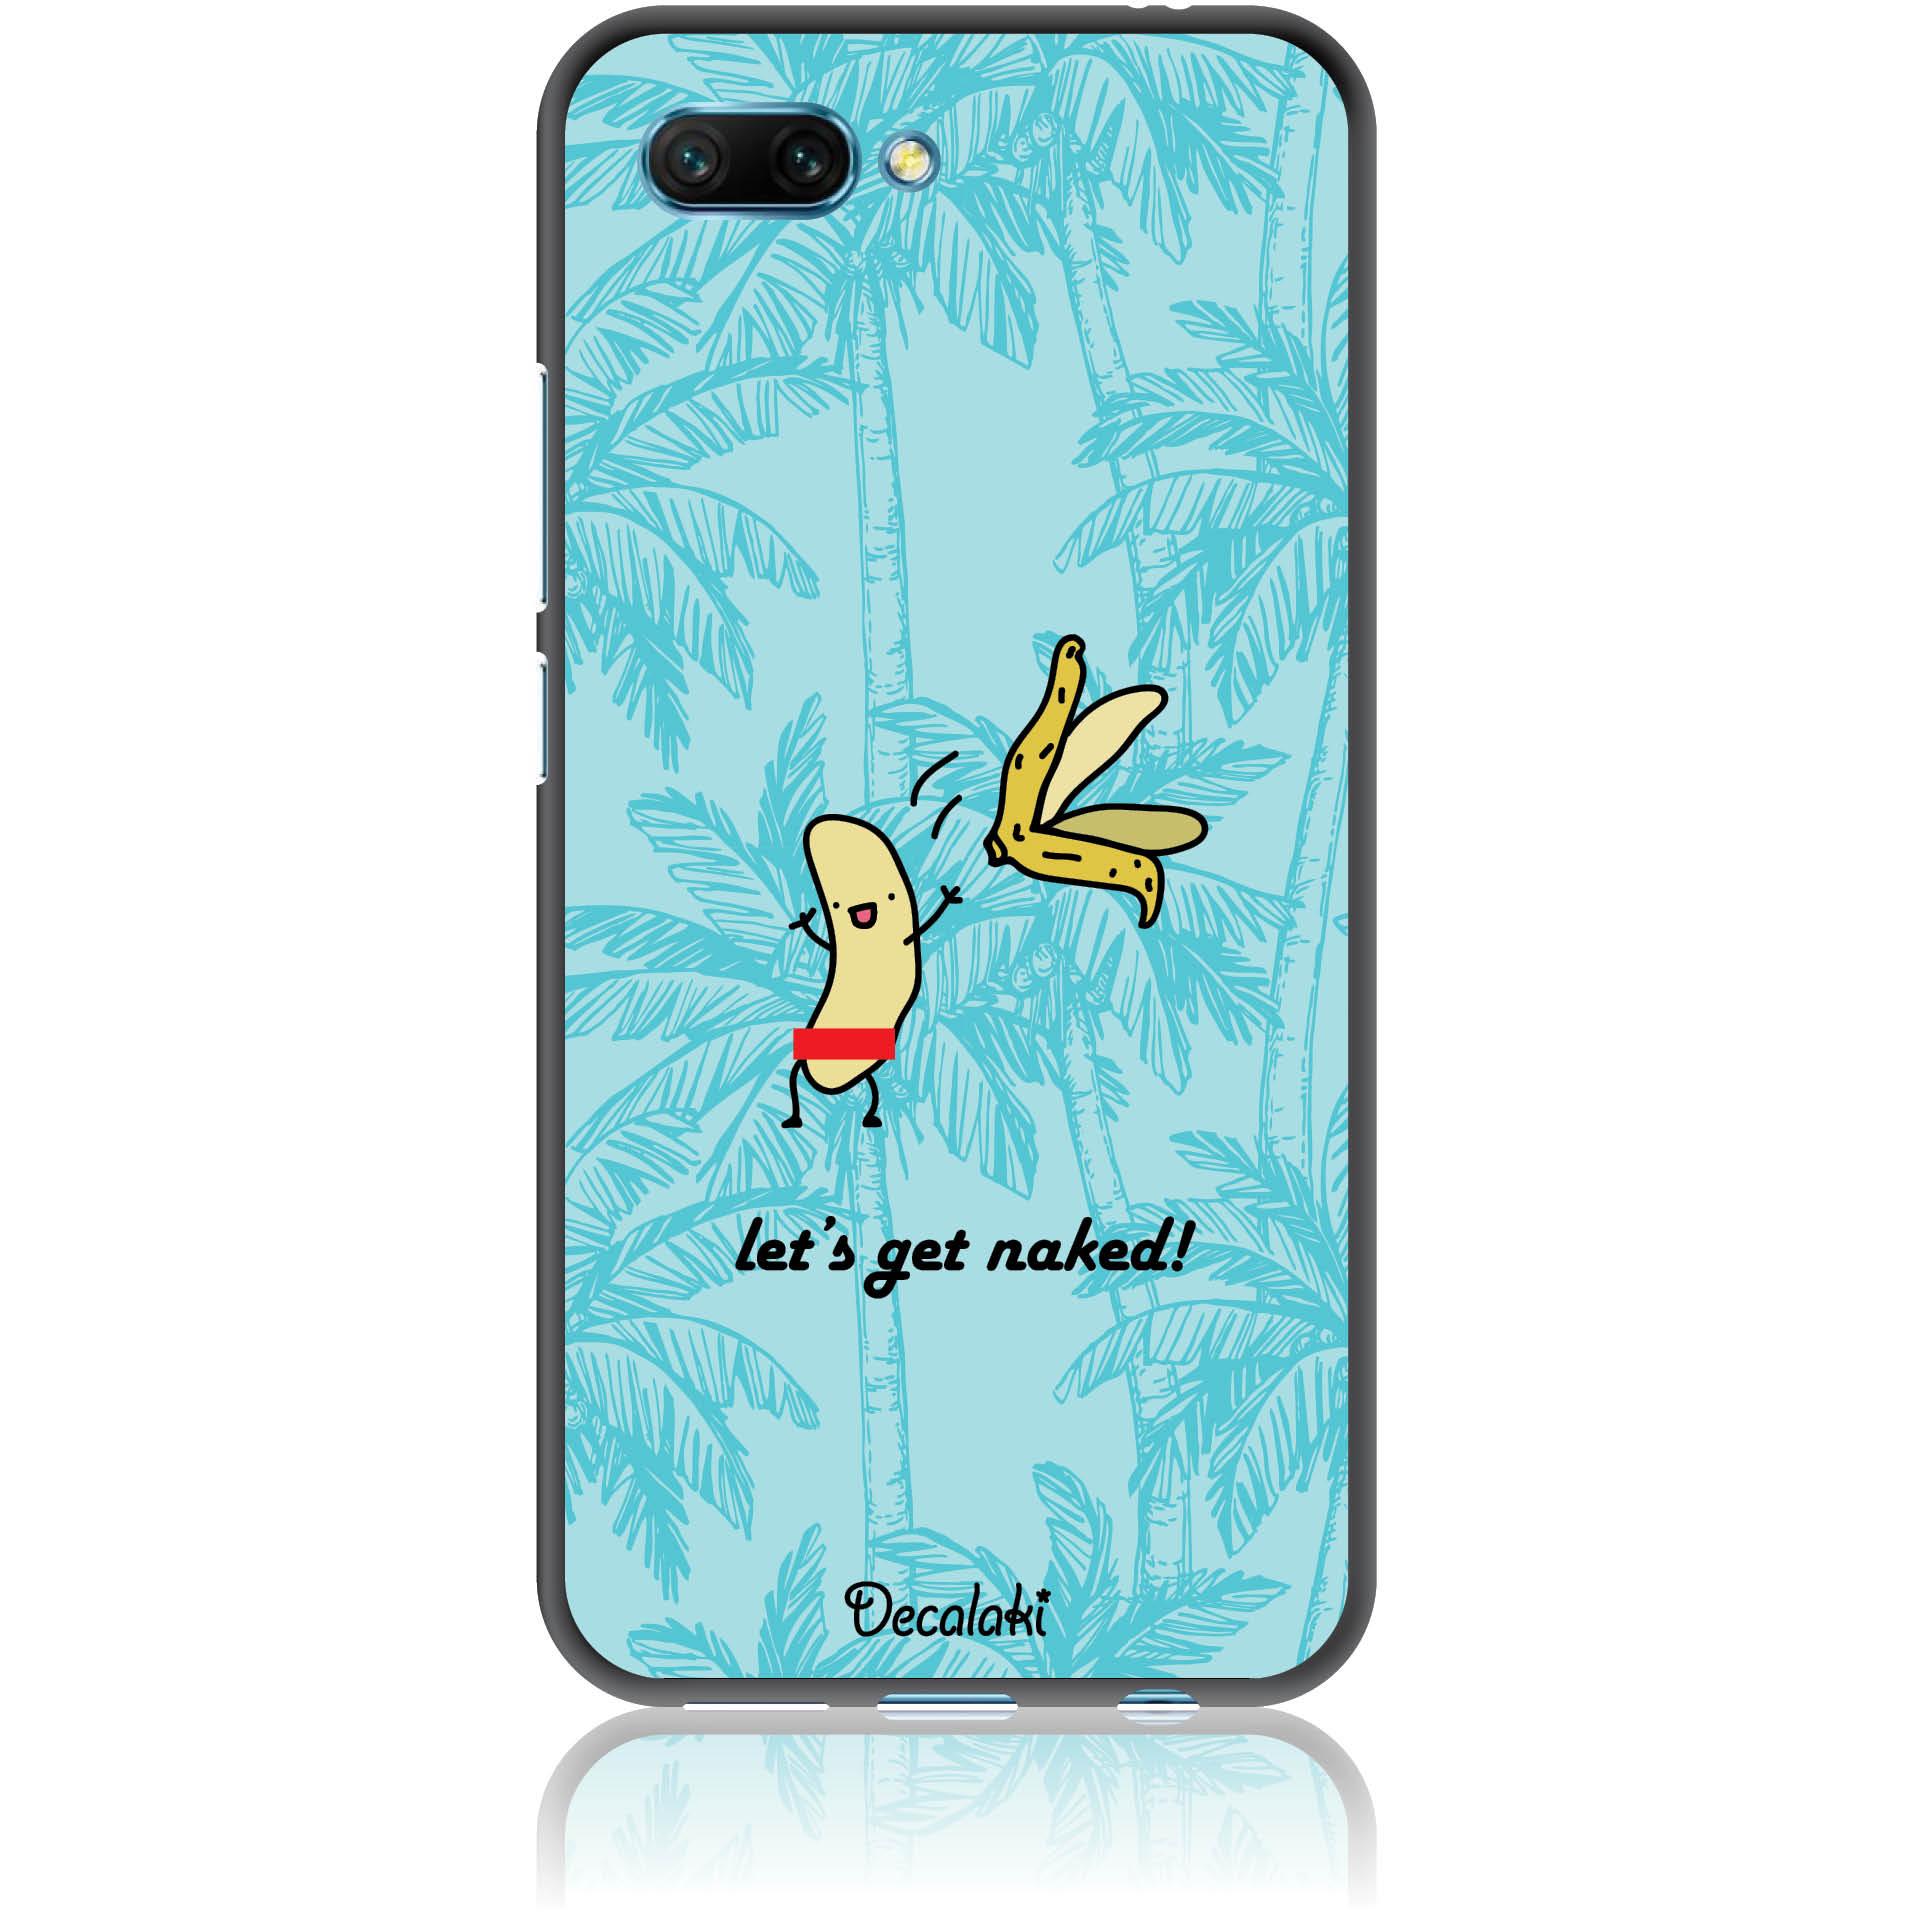 Let's Get Naked Phone Case Design 50431  -  Honor 10  -  Soft Tpu Case